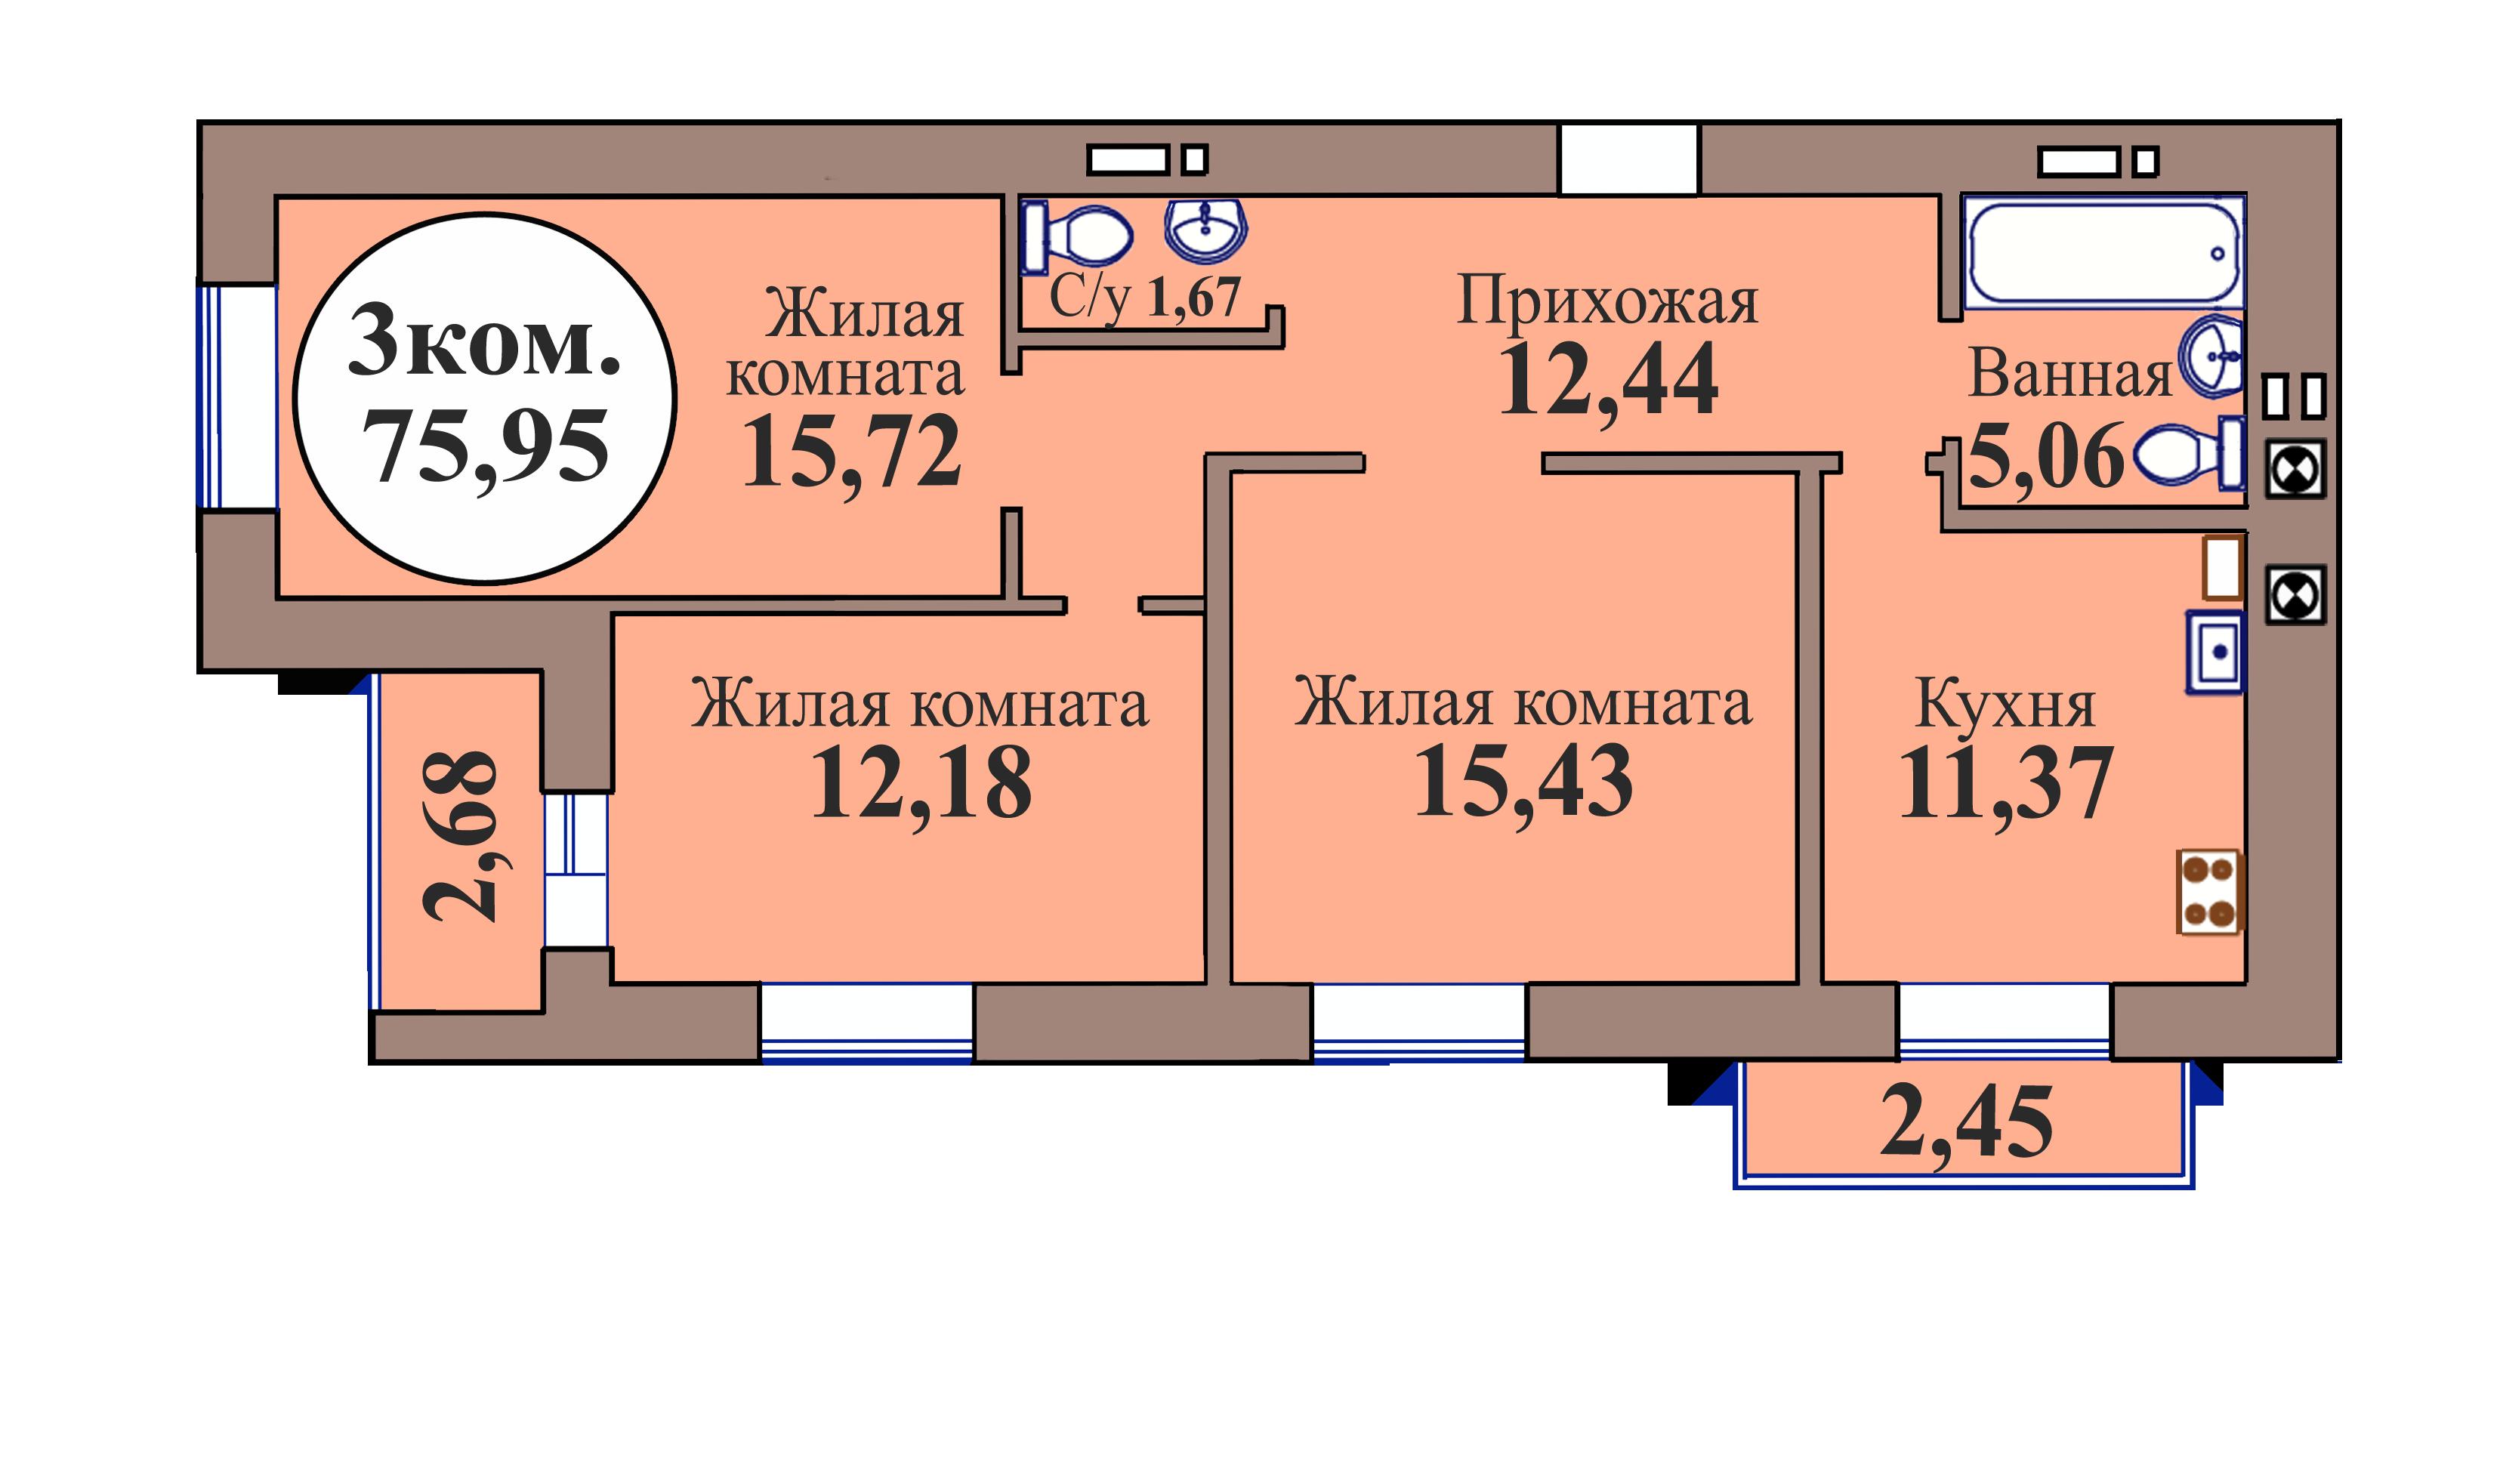 3-комн. кв. по пер. Калининградский, 5 кв. 236 в Калининграде